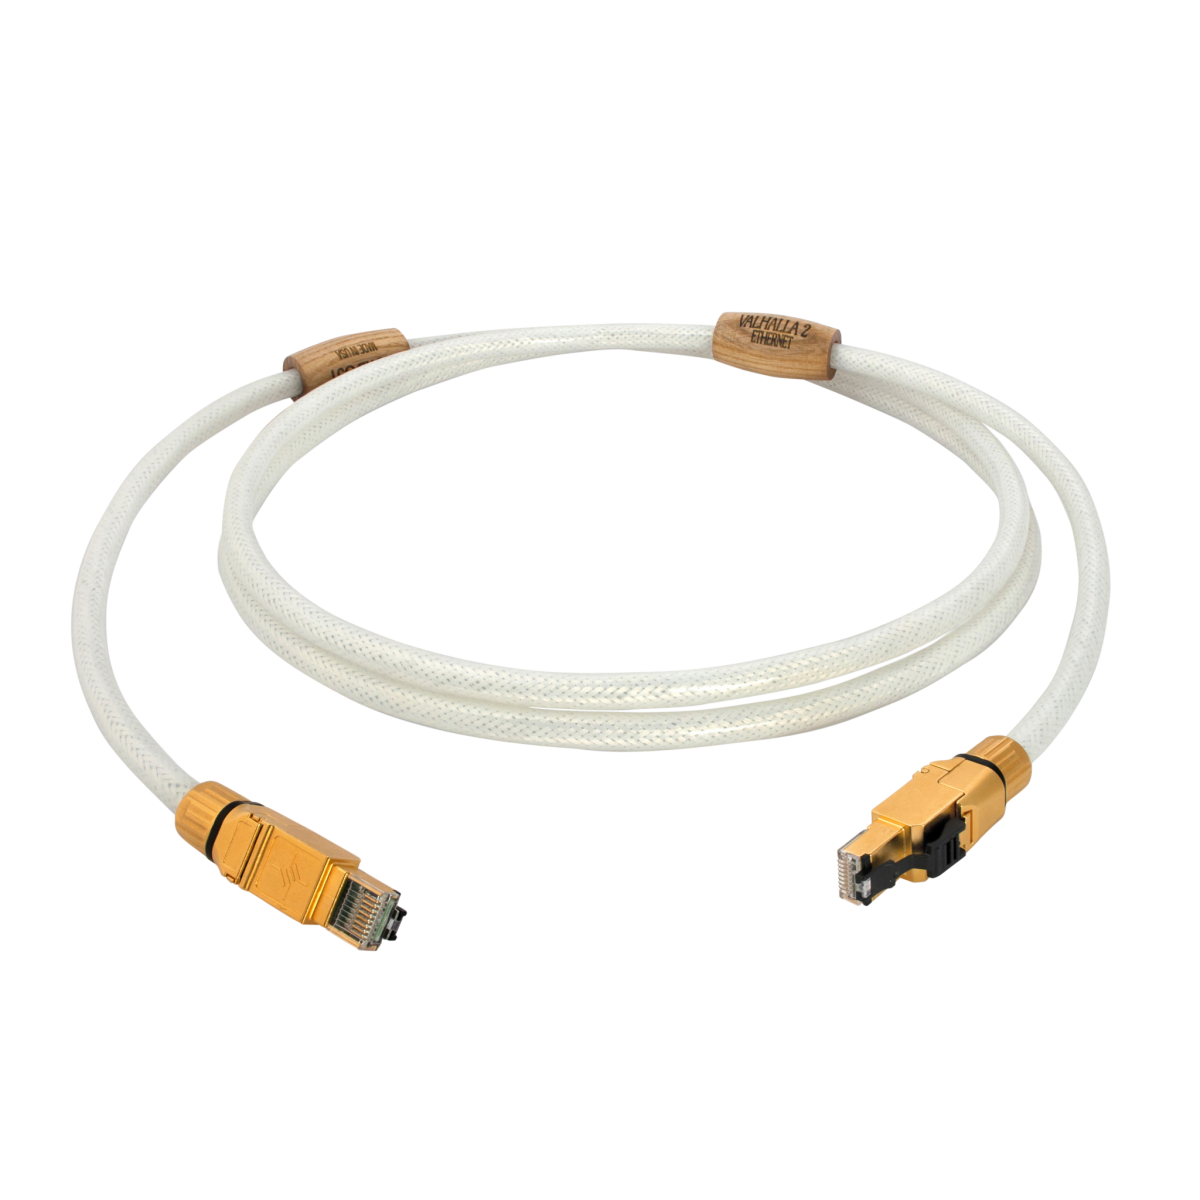 Nordost Valhalla 2 Ethernet cable